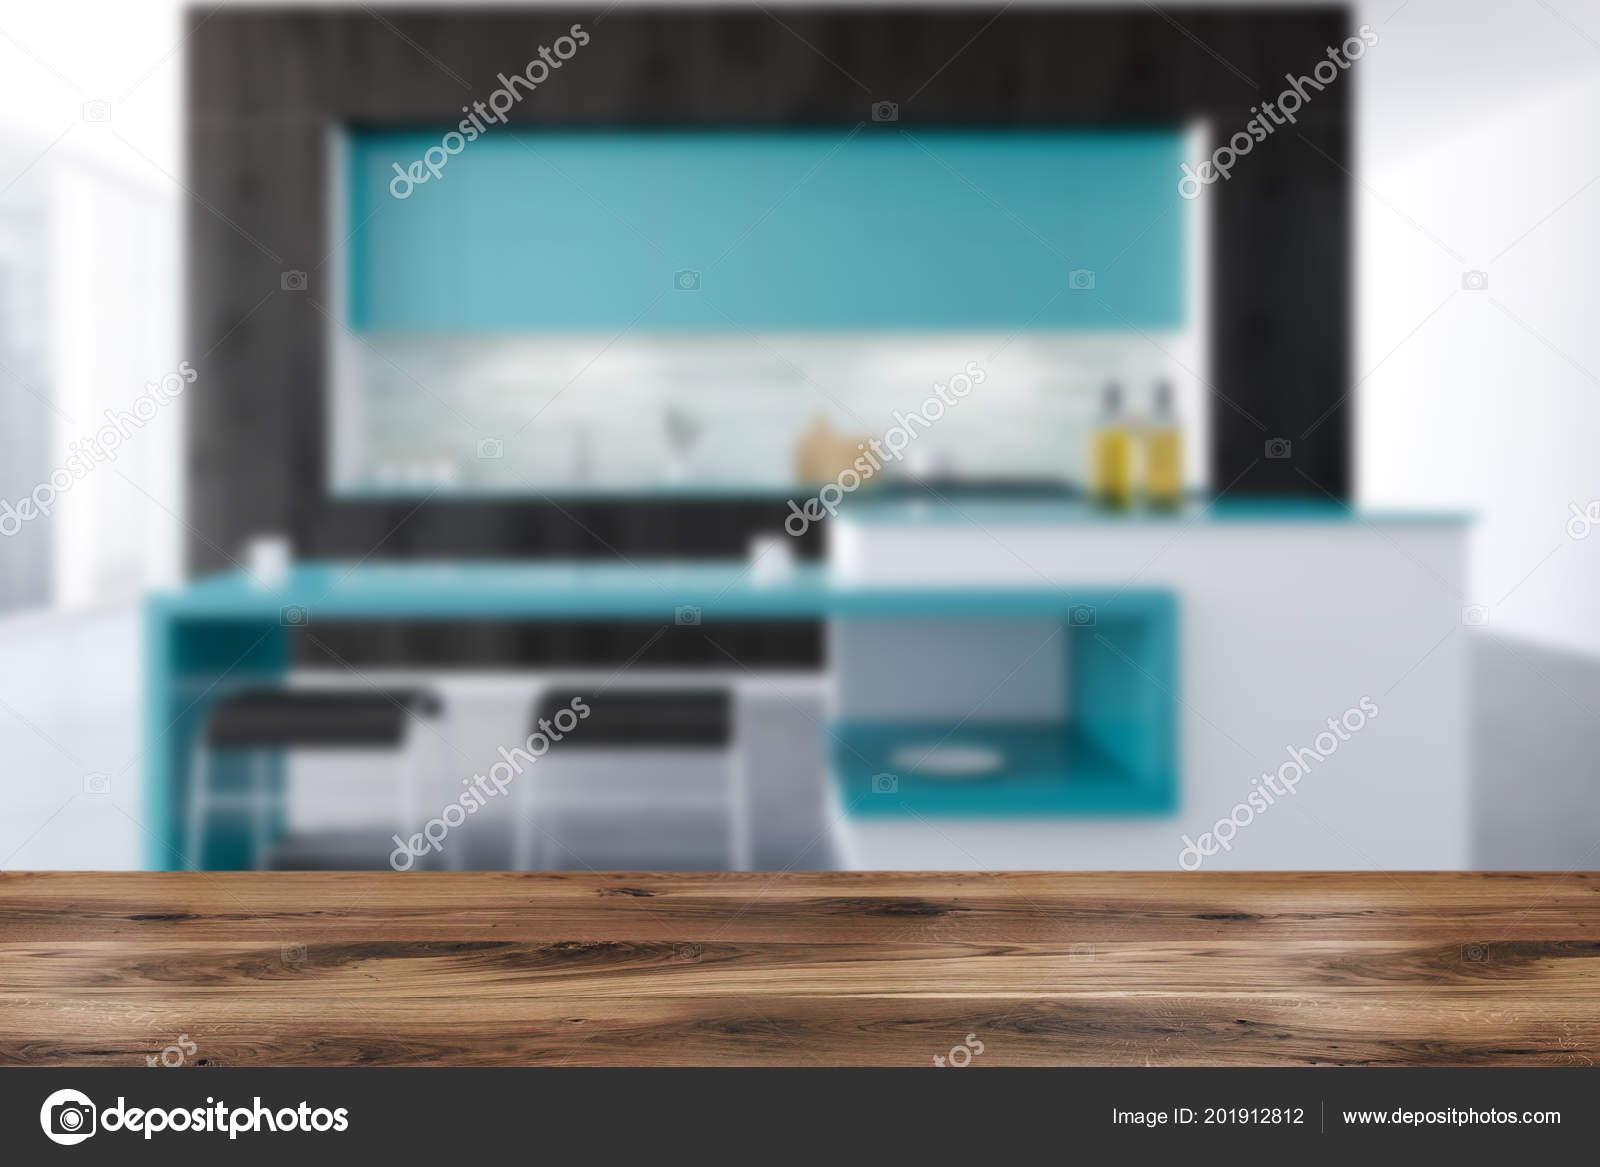 primal kitchen bars table with drawers 黑白原始厨房内部有混凝土地板黑色和蓝色台面和阁楼窗口渲染模拟模糊 黑白原始厨房内部有混凝土地板 黑色和蓝色台面和阁楼窗口 酒吧 3d 渲染模拟模糊 照片作者denisismagilov